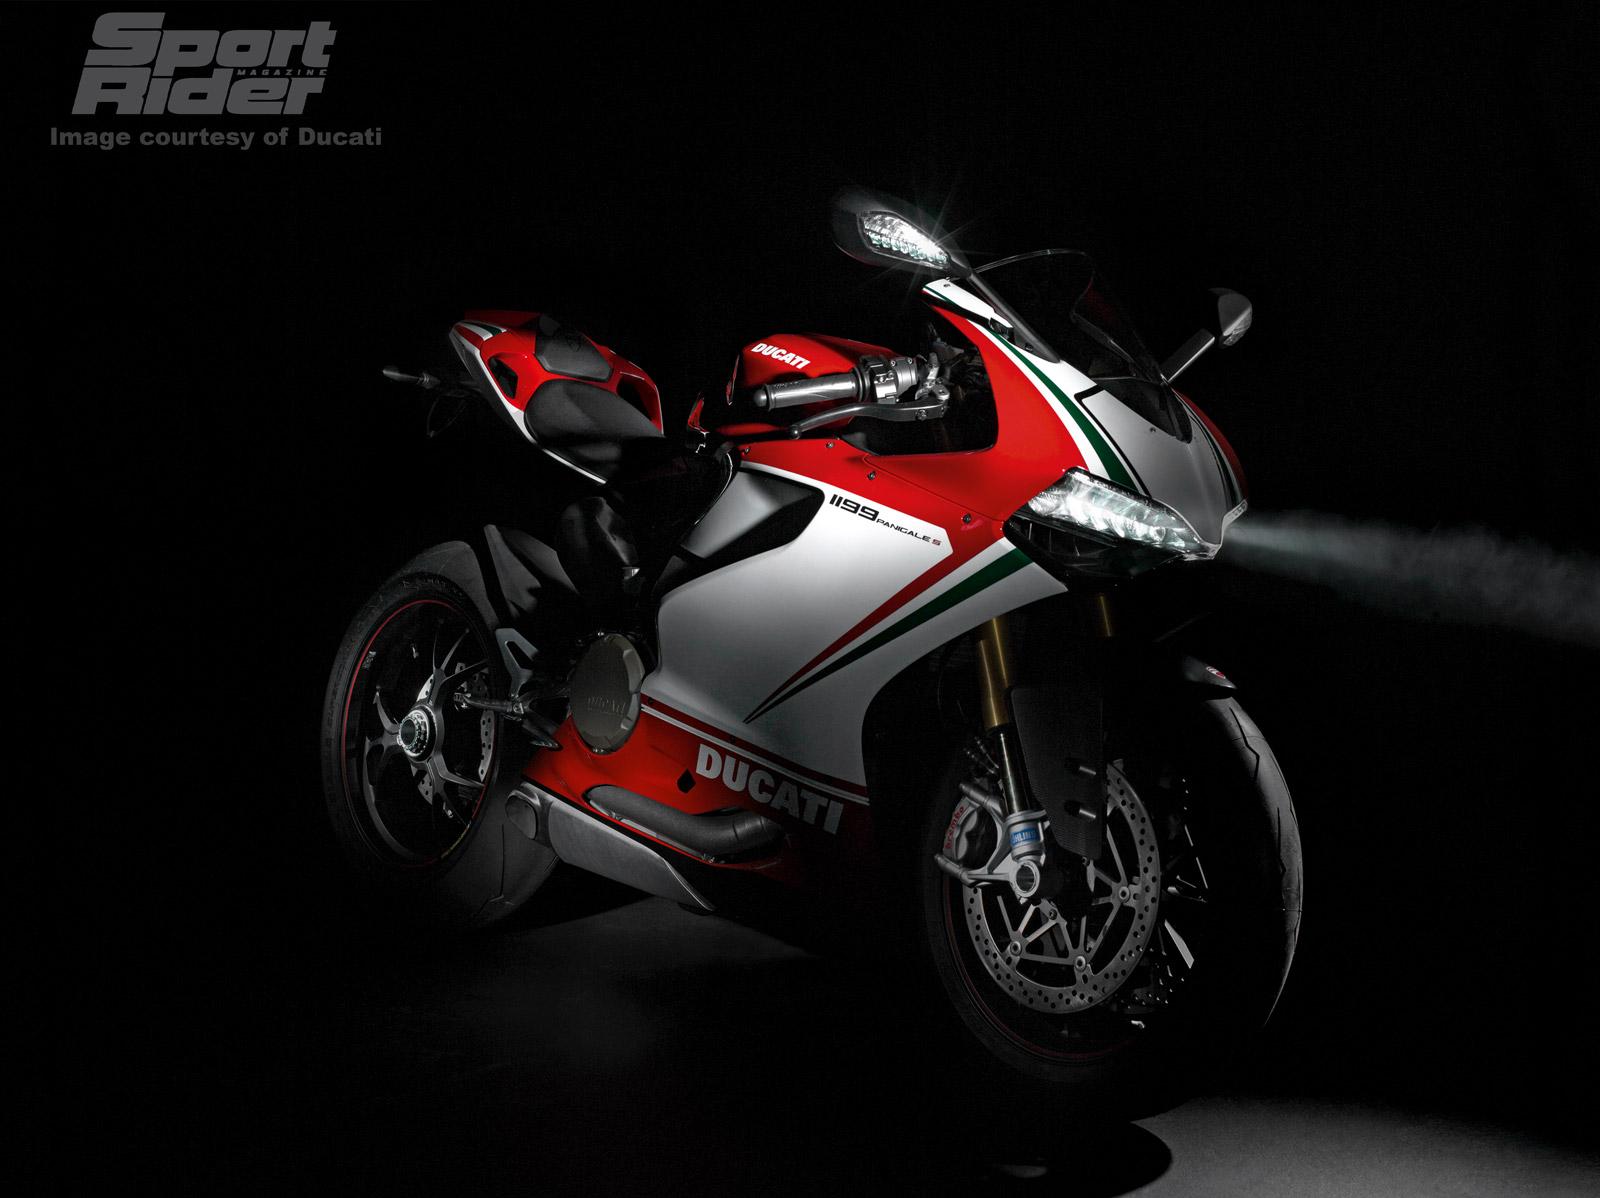 Ducati Panigale Wallpaper Hd 19992 Hd Wallpapers in Bikes   Imagesci 1600x1198